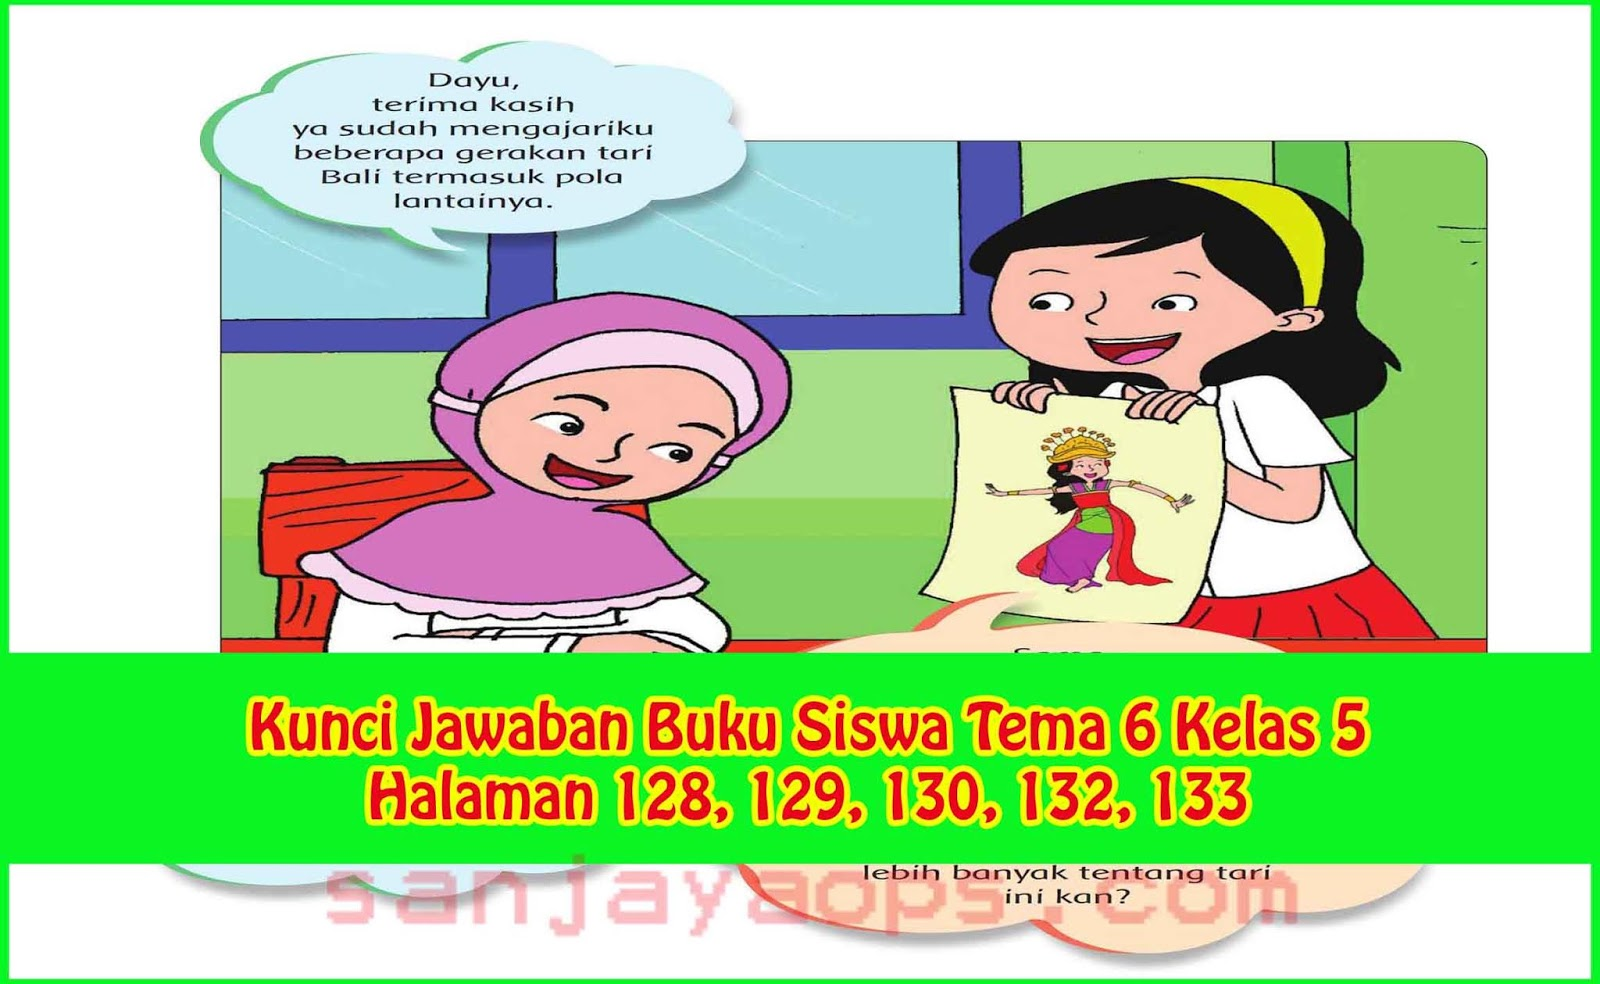 Kunci Jawaban Buku Bahasa Jawa Kelas 5 Kurikulum 2013 ...